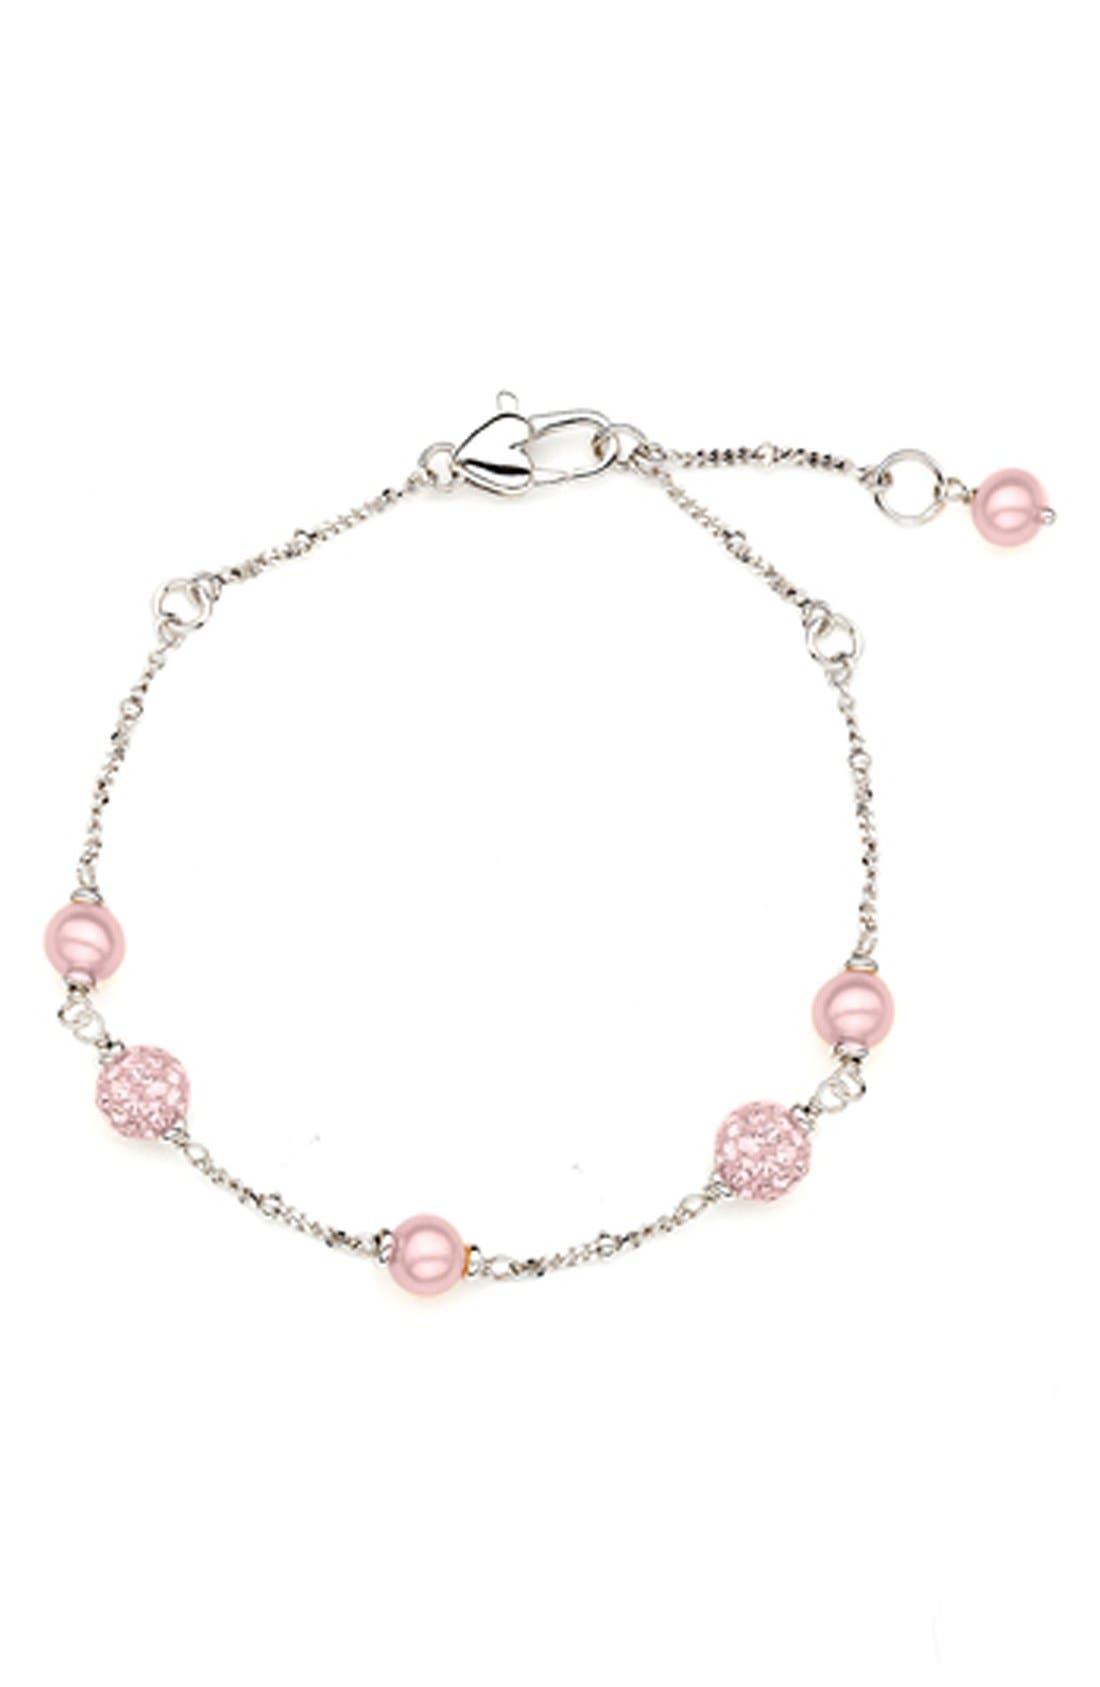 Main Image - HONORA Crystal & Freshwater Pearl Station Bracelet (Girls)